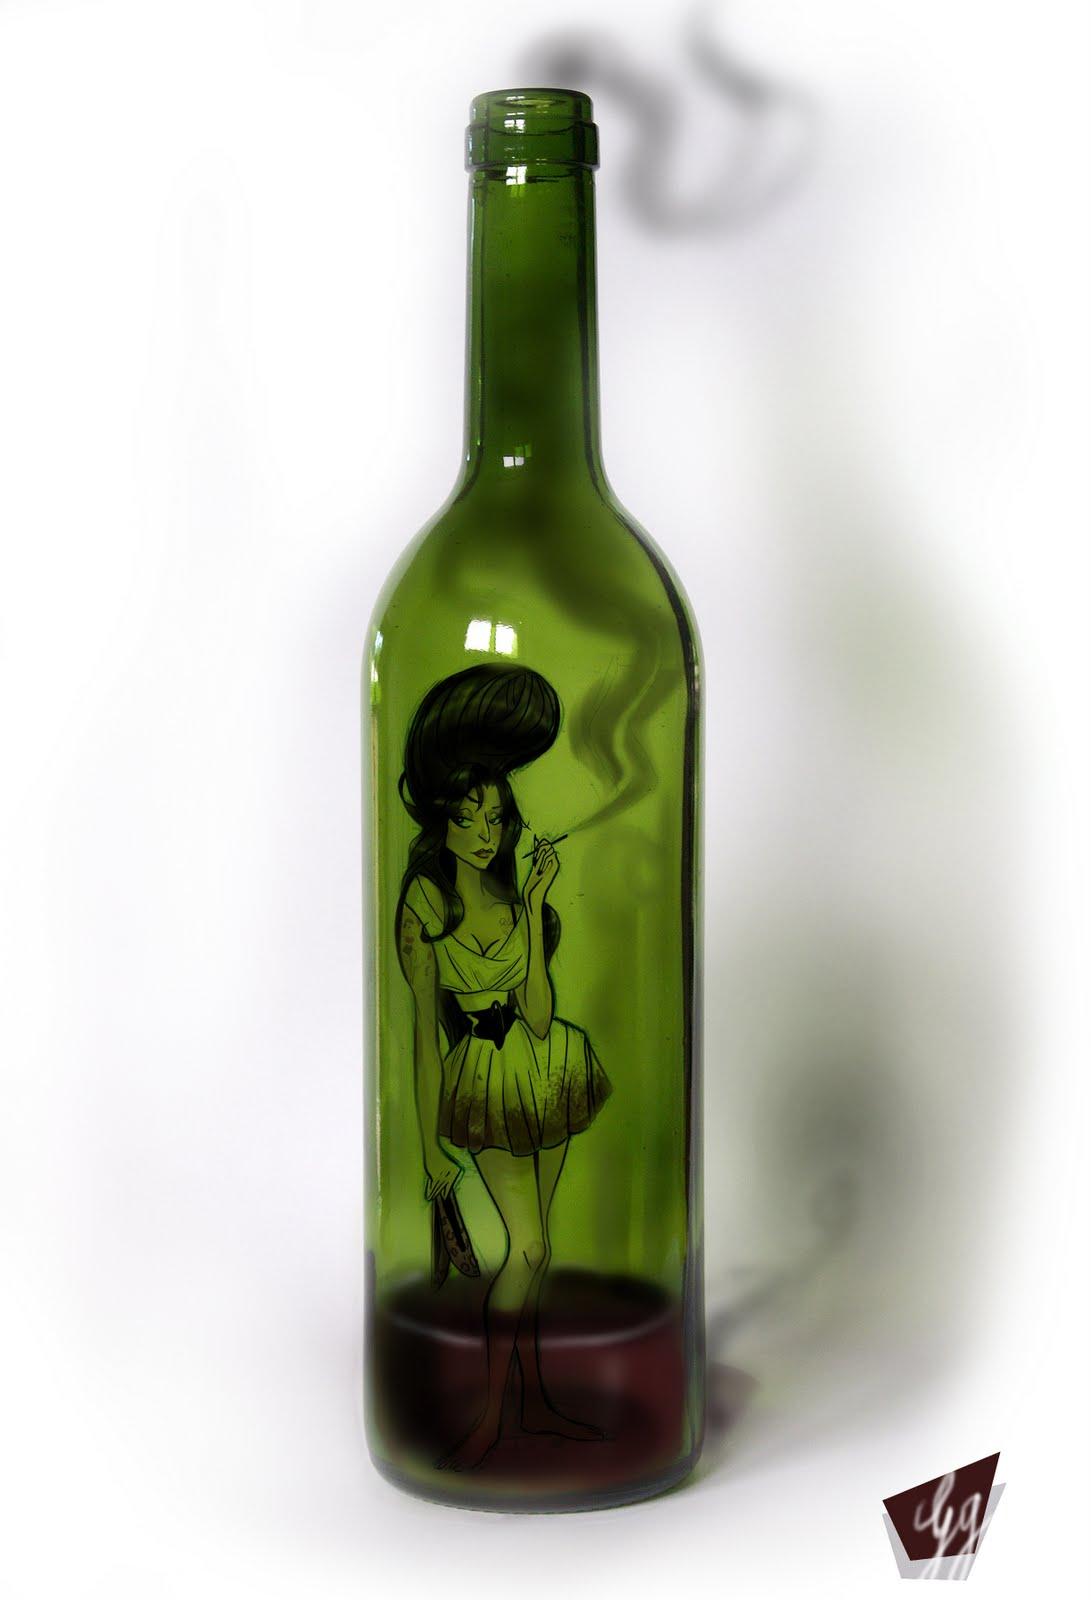 http://1.bp.blogspot.com/_wAetrwi9oNk/TKokw9odcVI/AAAAAAAAASA/IpGU2FdoucM/s1600/wine-bottlexG.jpg